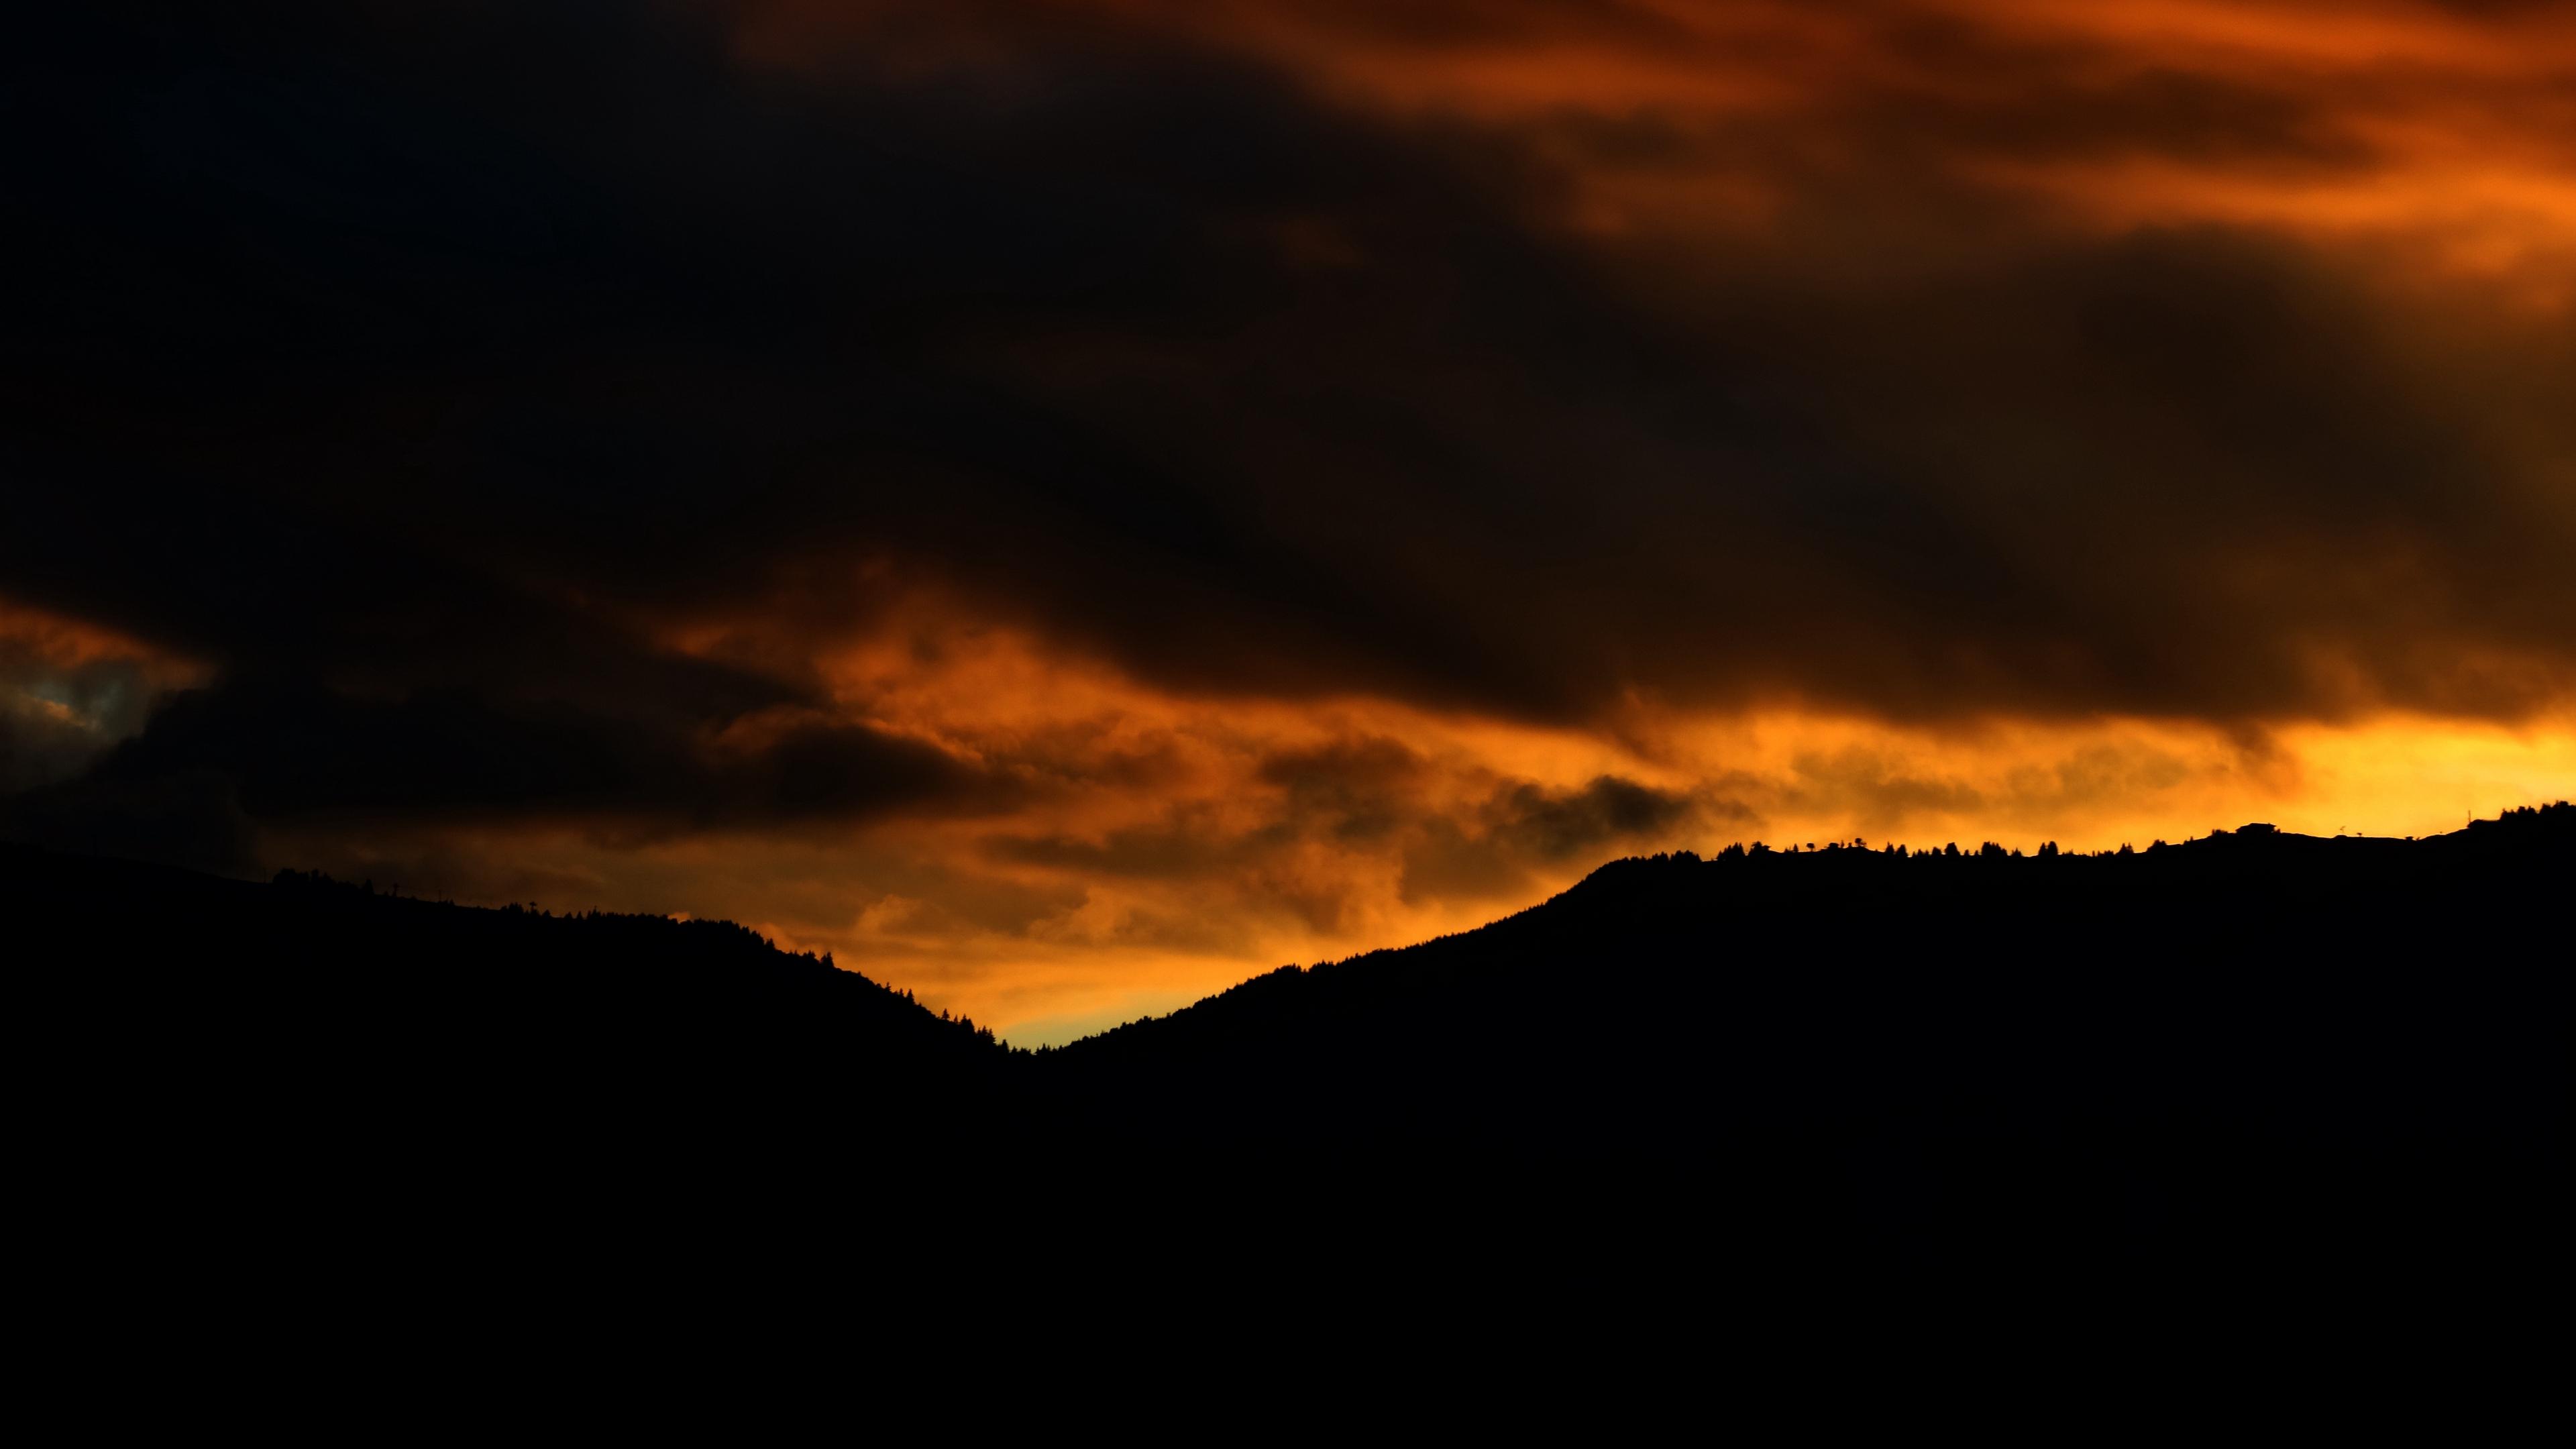 sunset mountains clouds cloudy 4k 1536017763 - sunset, mountains, clouds, cloudy 4k - sunset, Mountains, Clouds